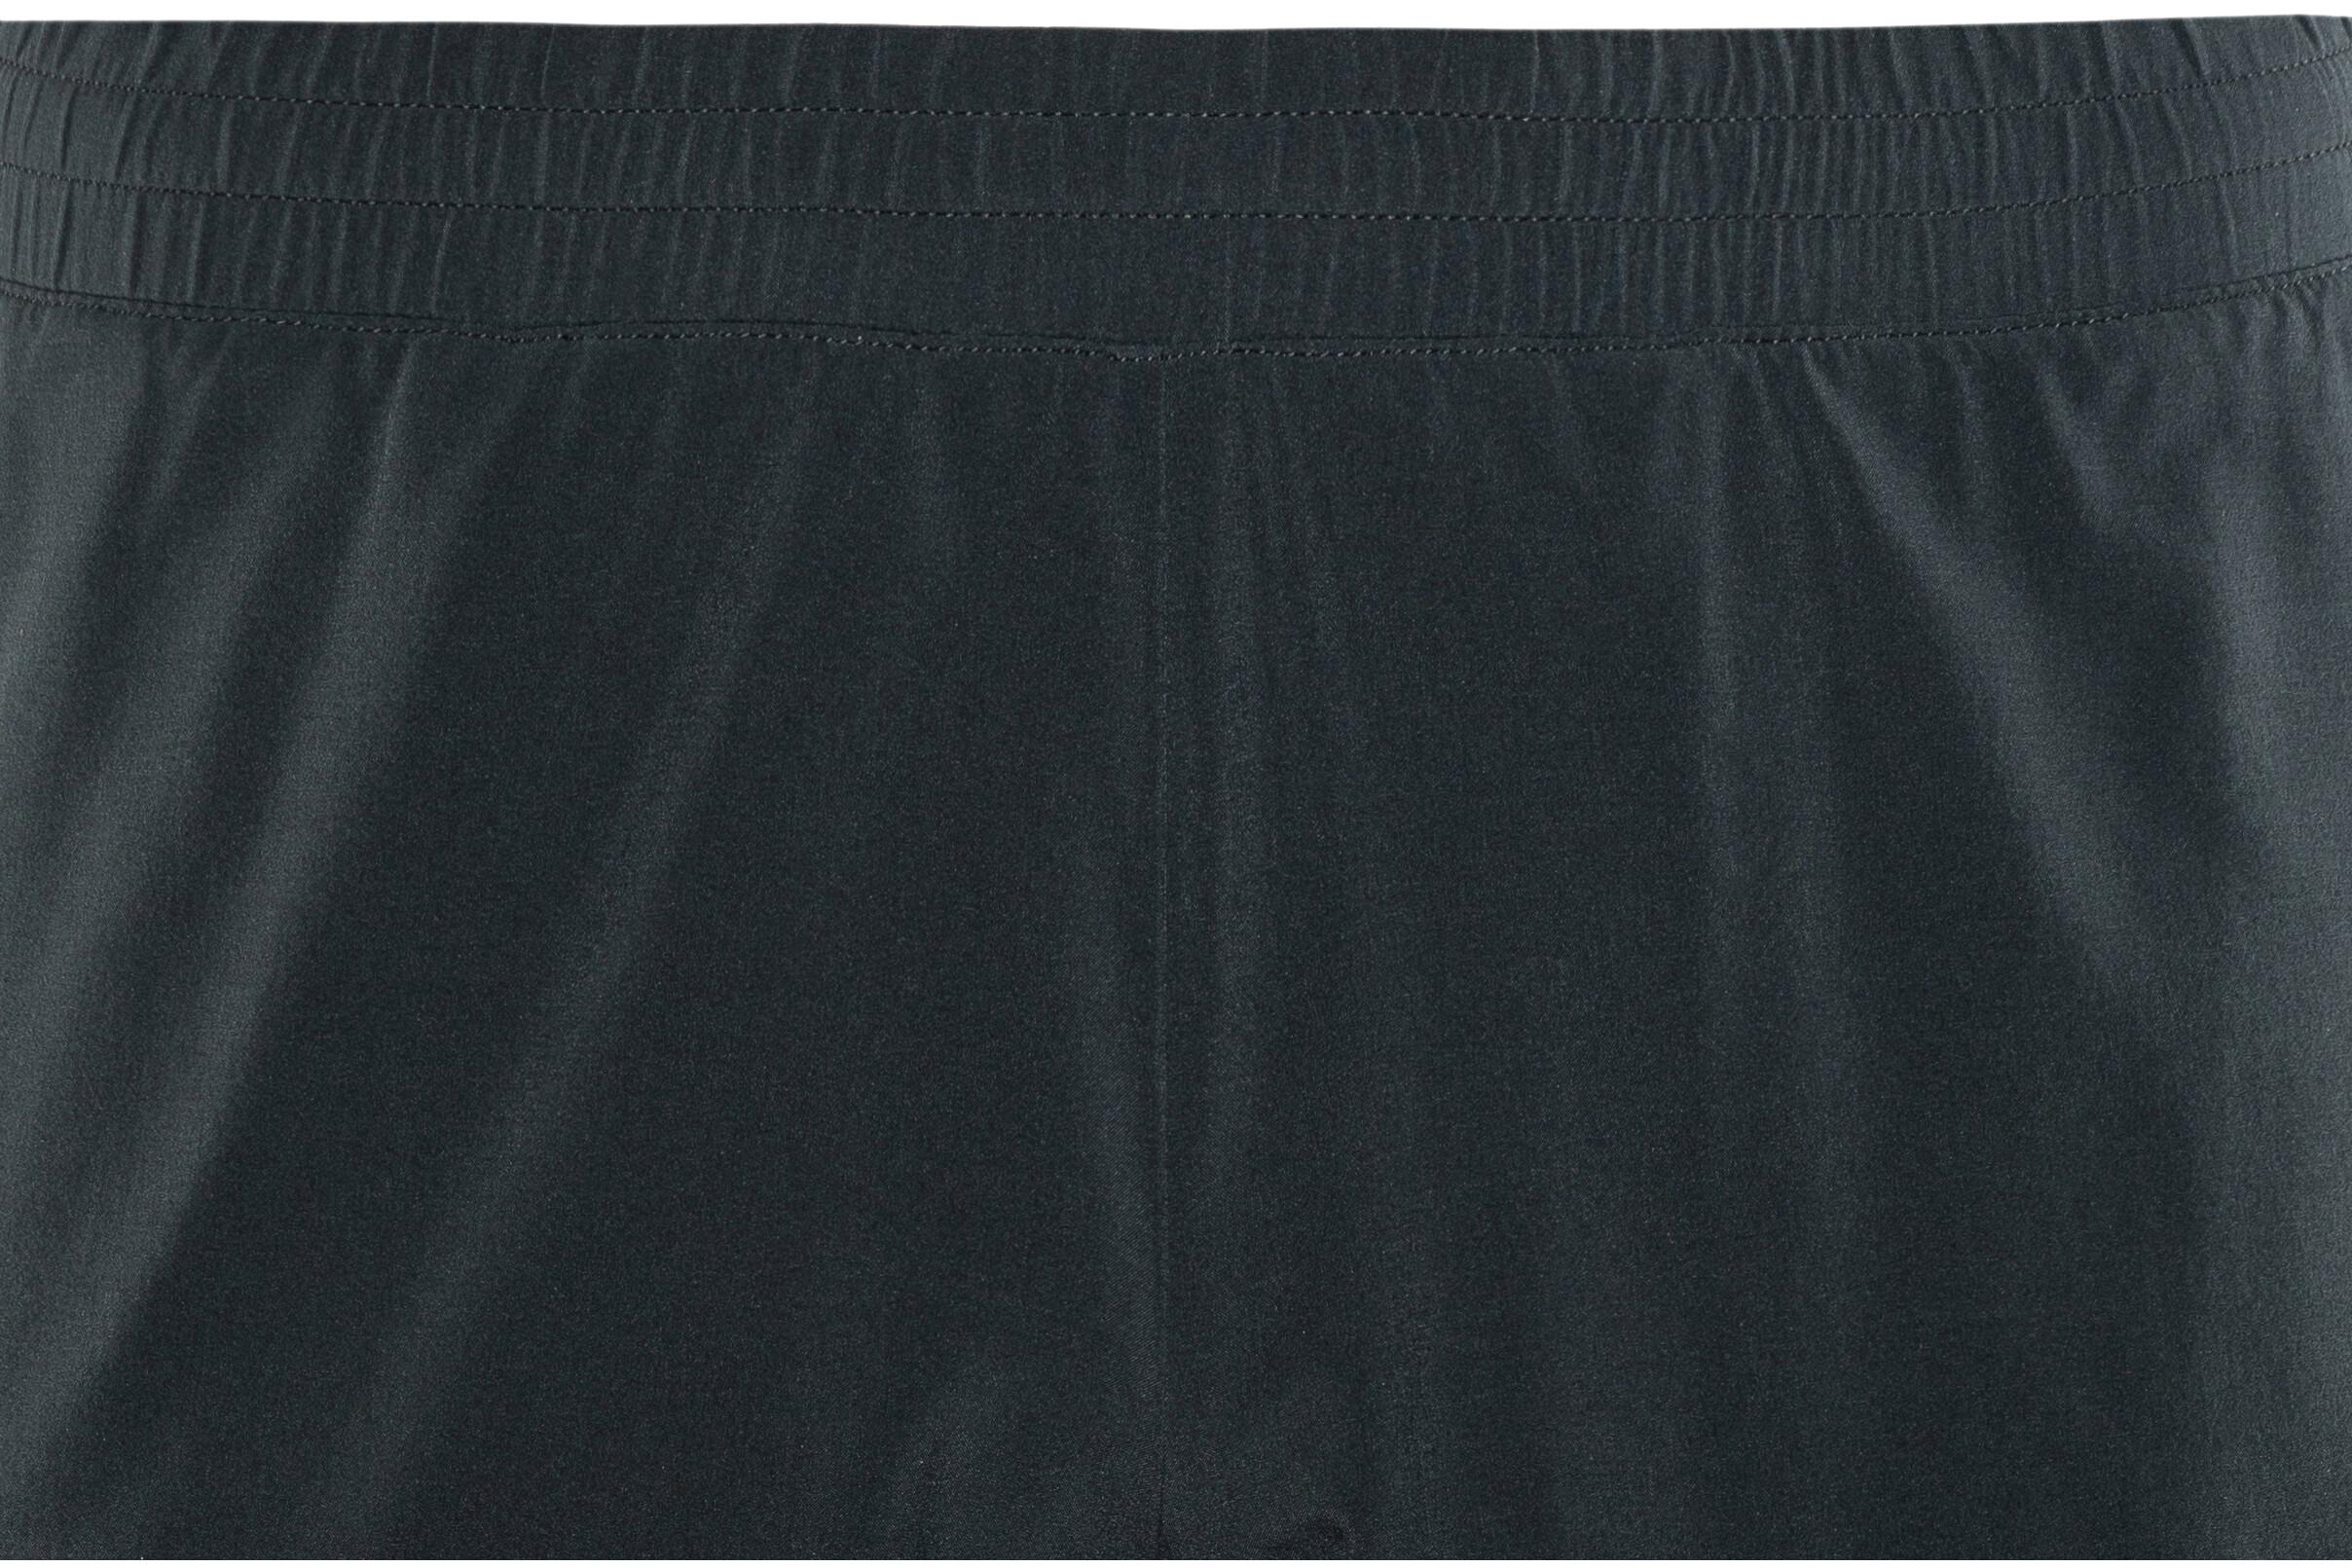 d737efb92f1 Odlo Millennium Linencool PRO Hardloop Shorts Heren grijs/zwart I ...